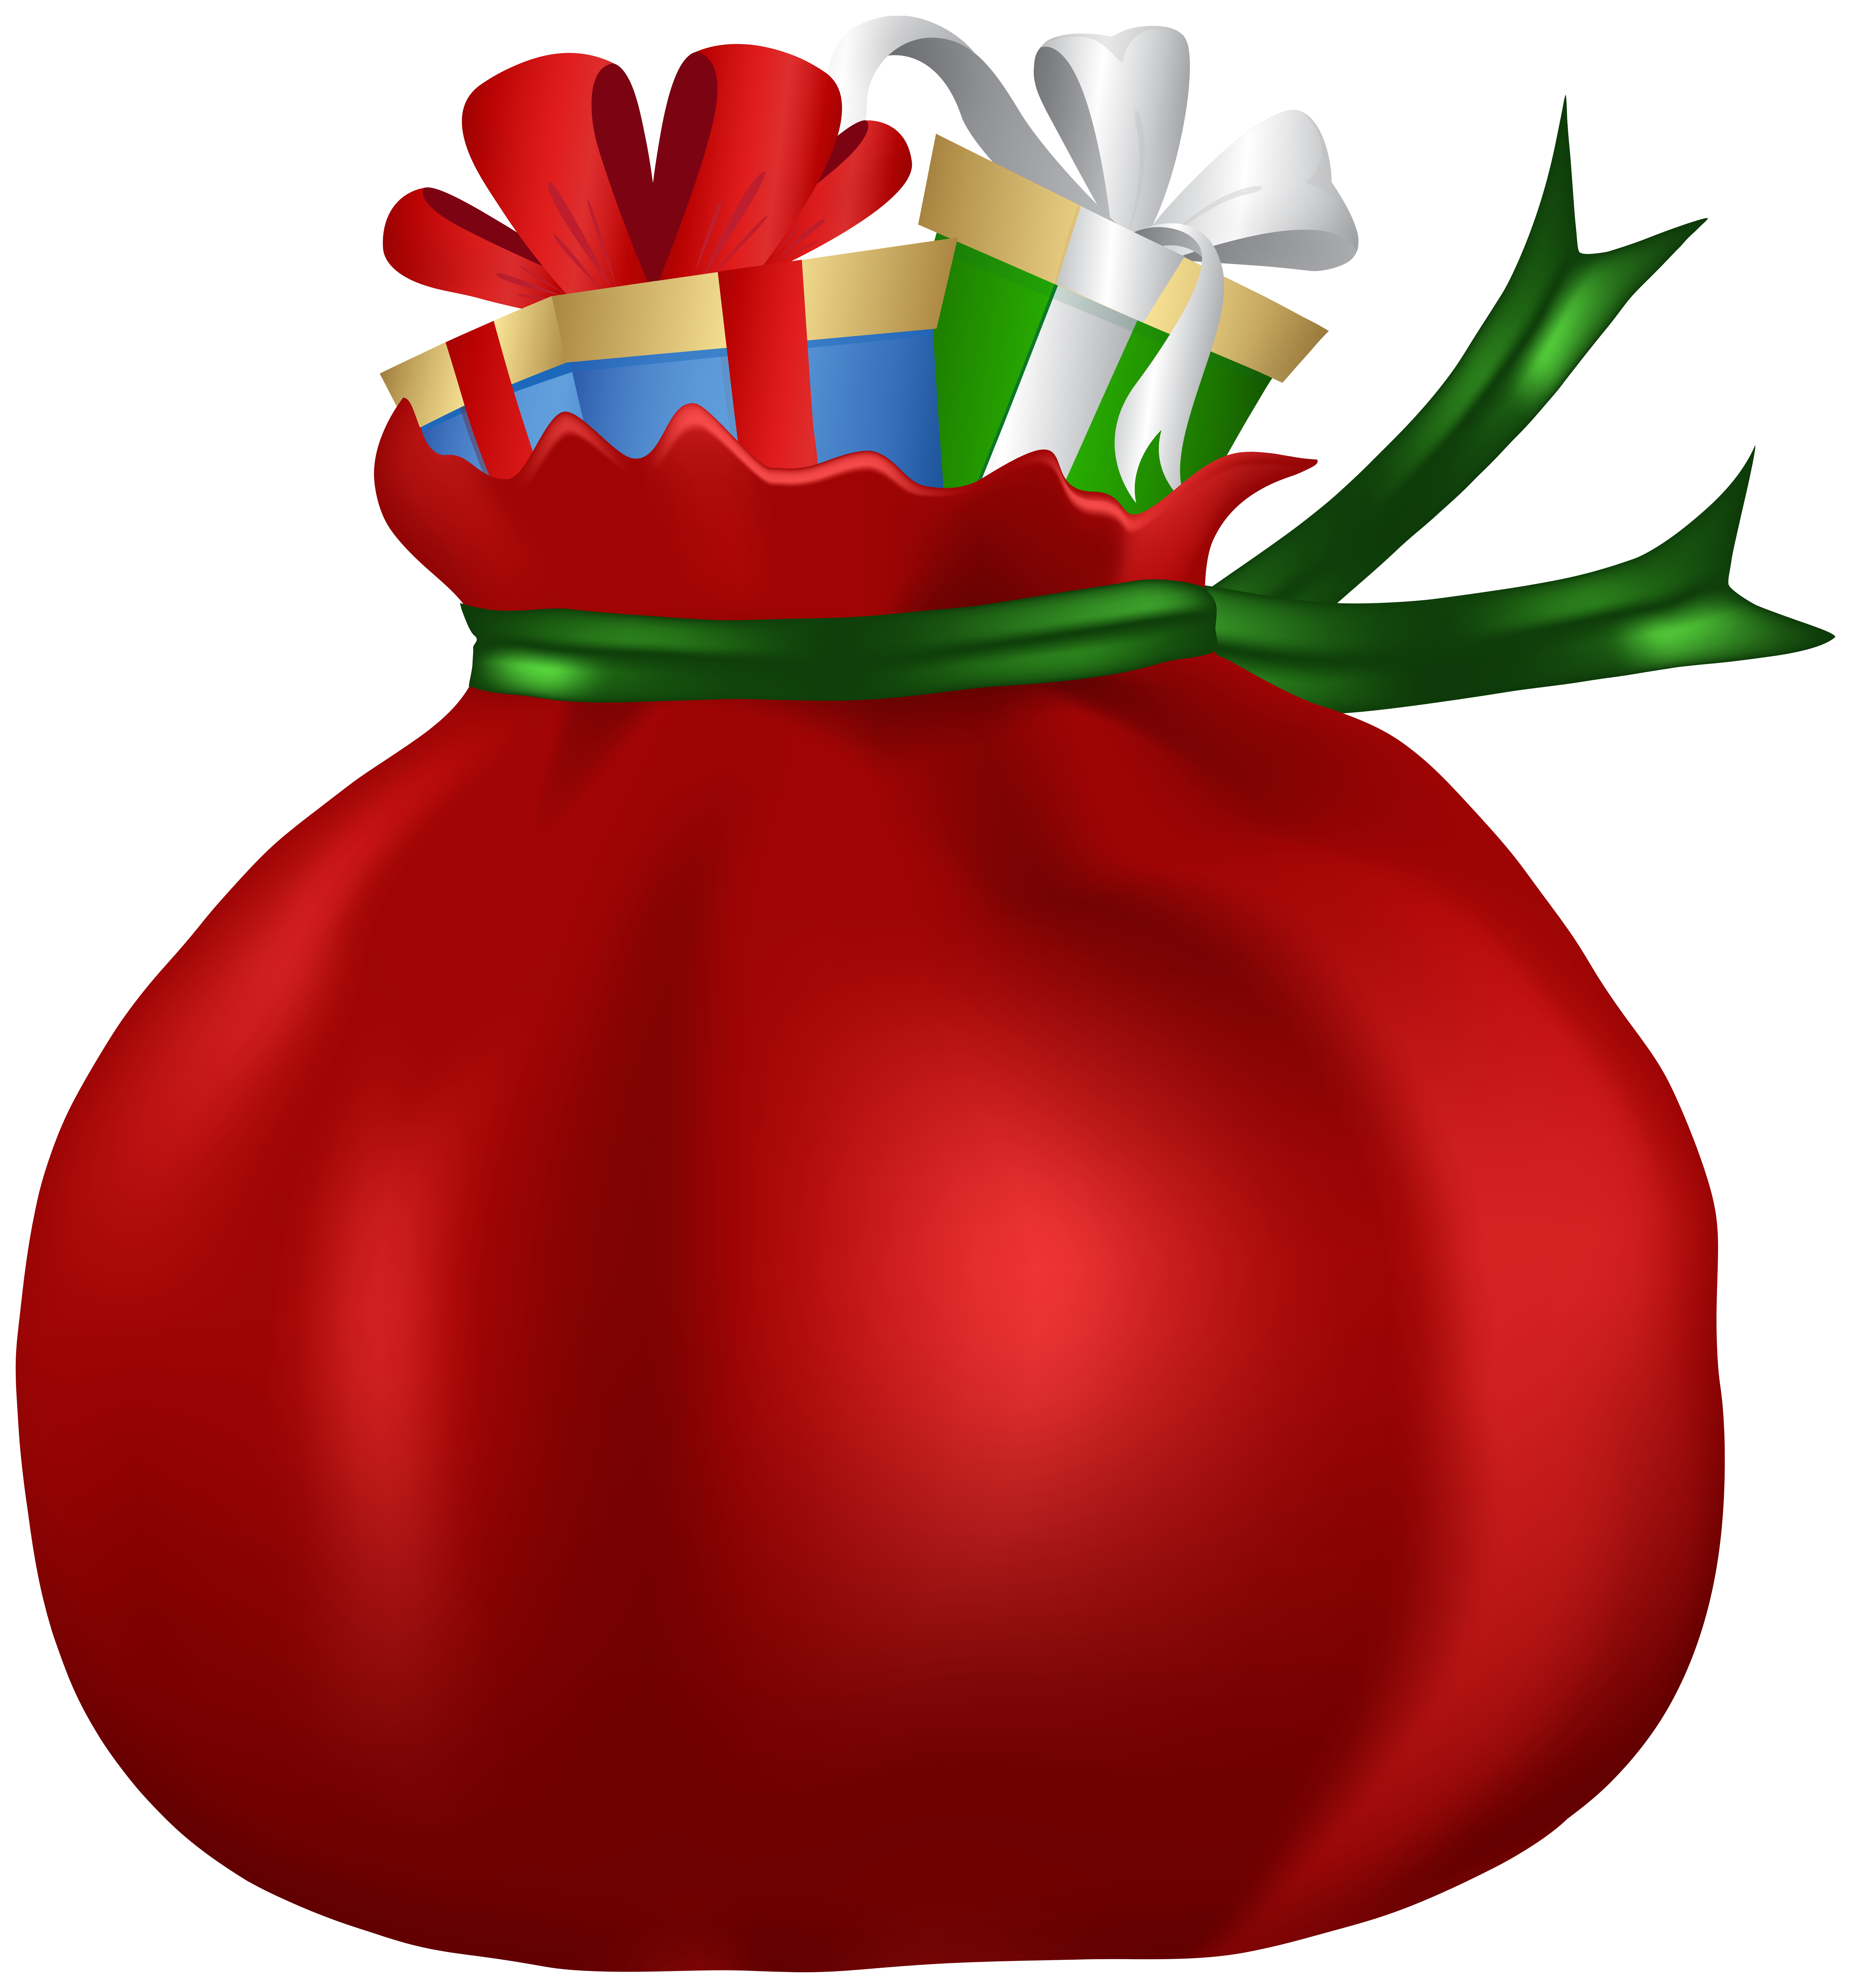 Red Santa Claus Bag Clip Art Image.